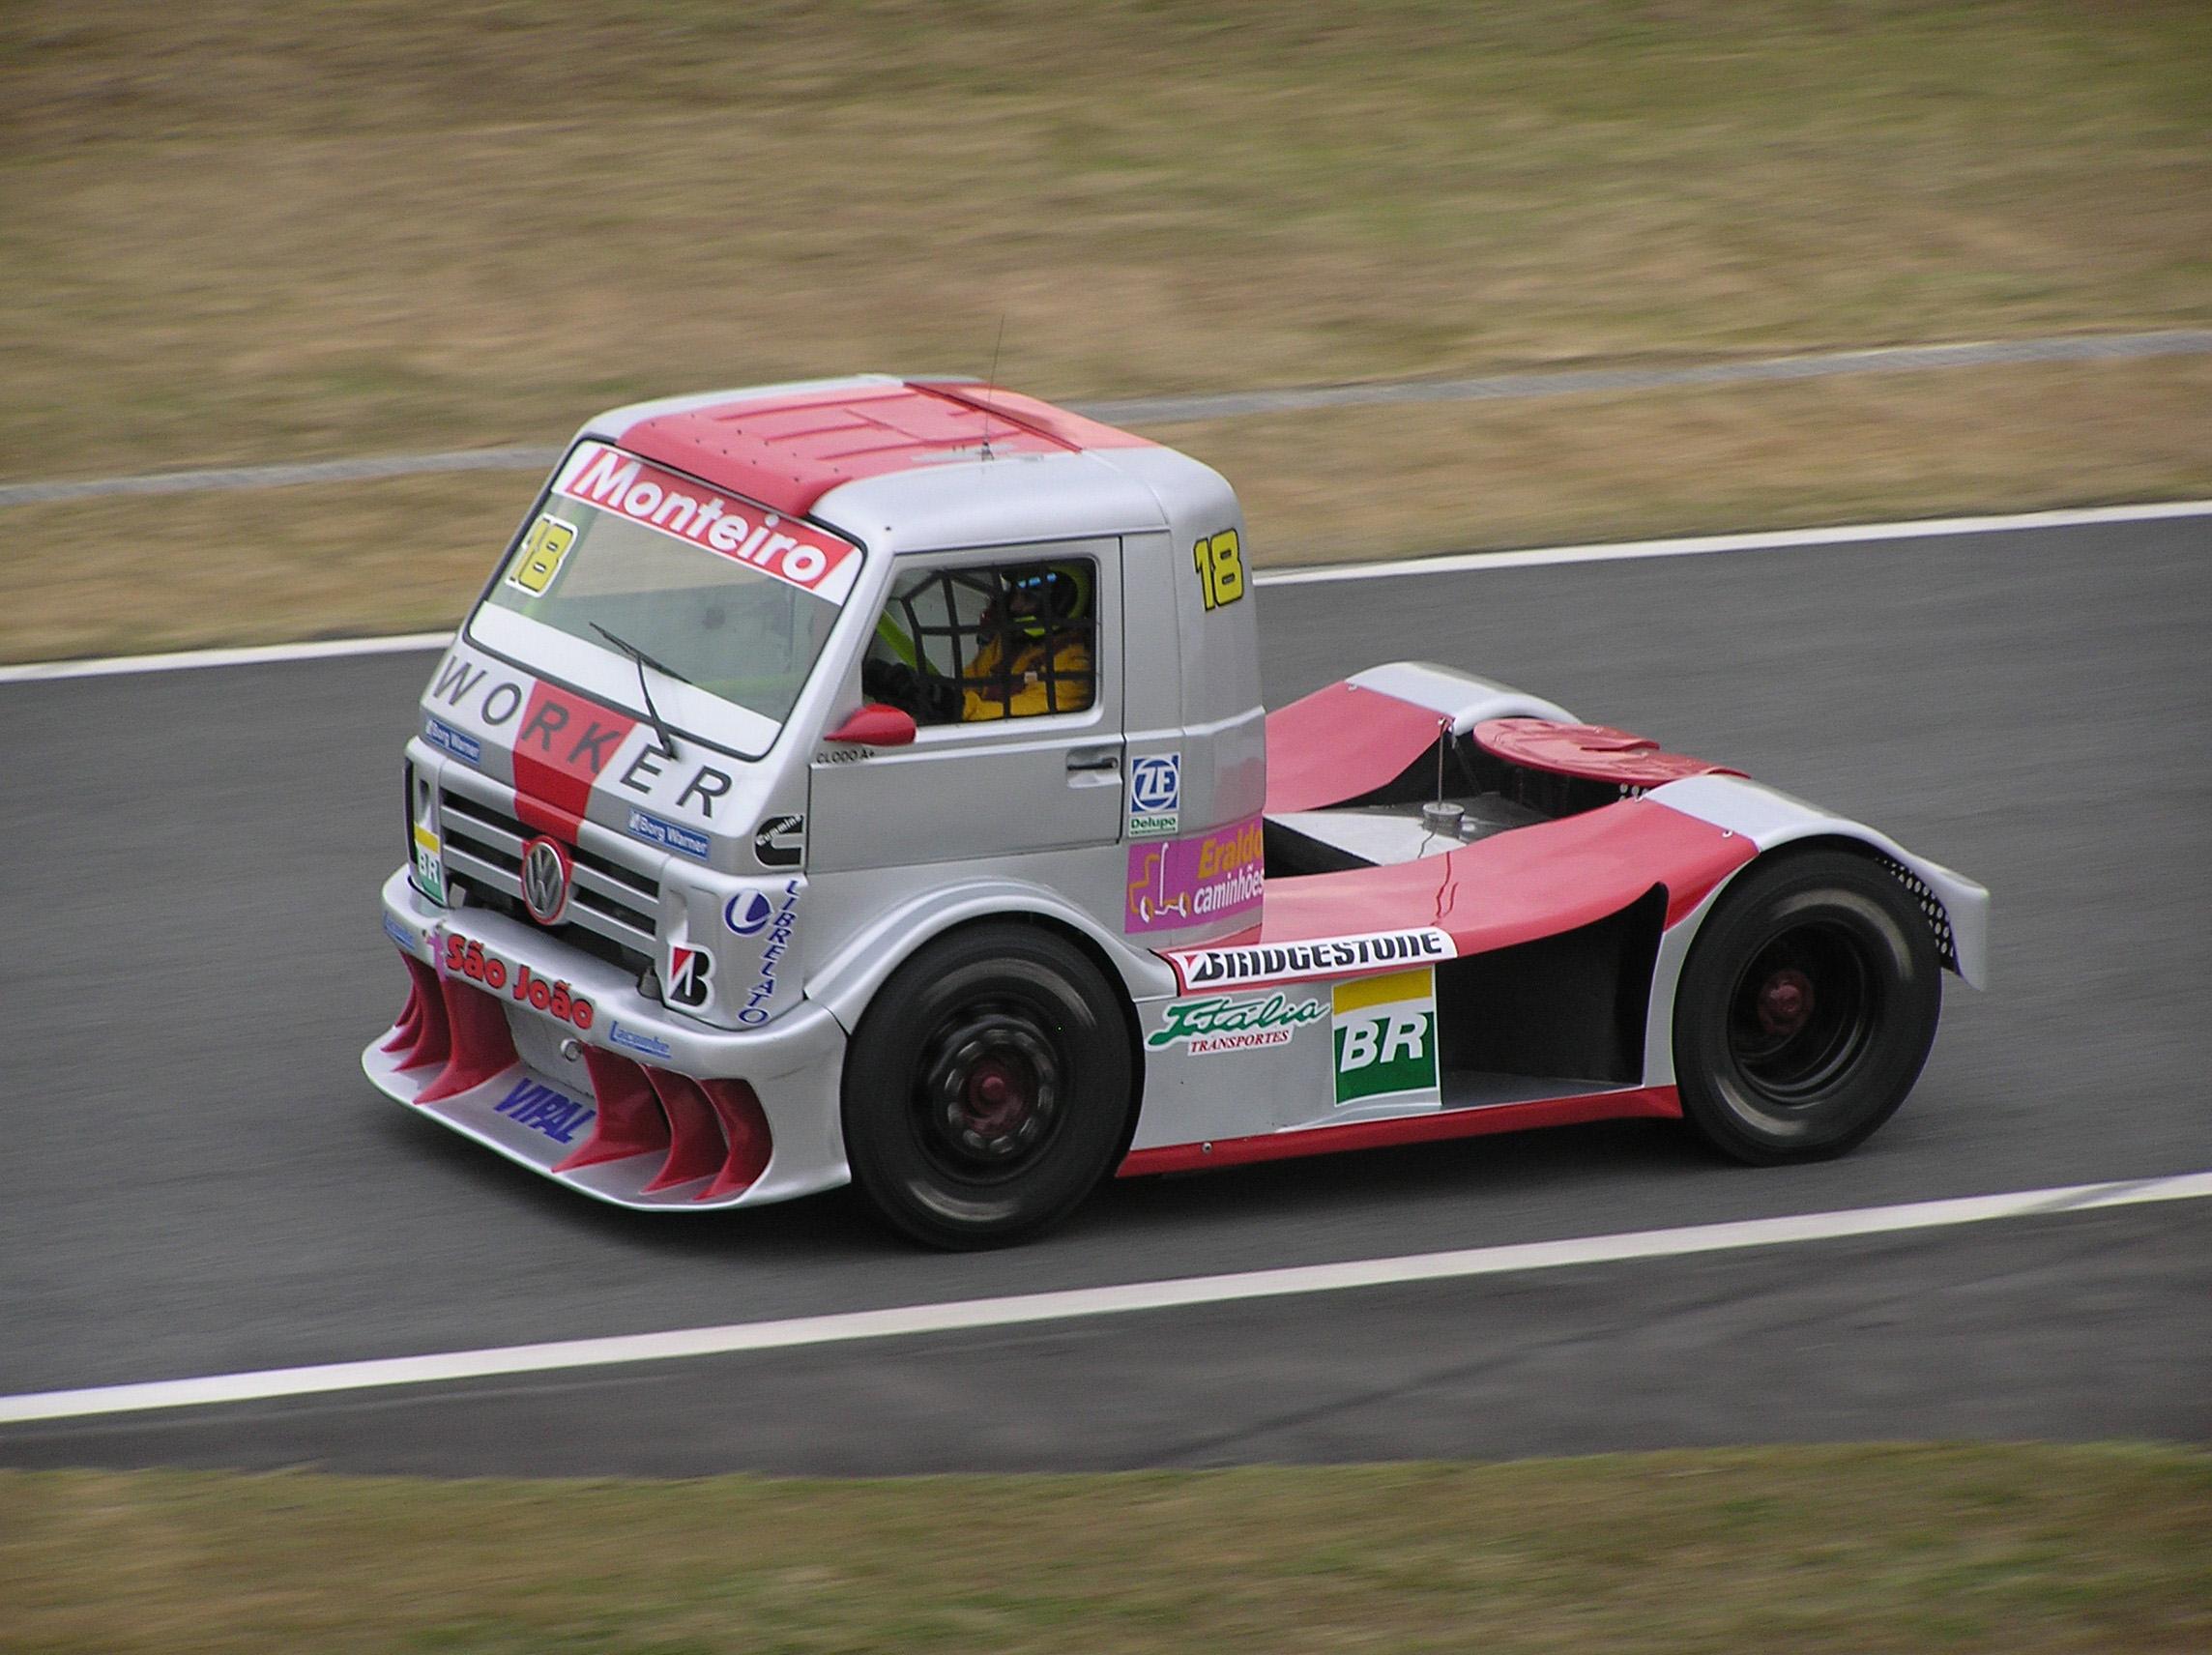 Formula_Truck_2006_Volkswagen_Monteiro..